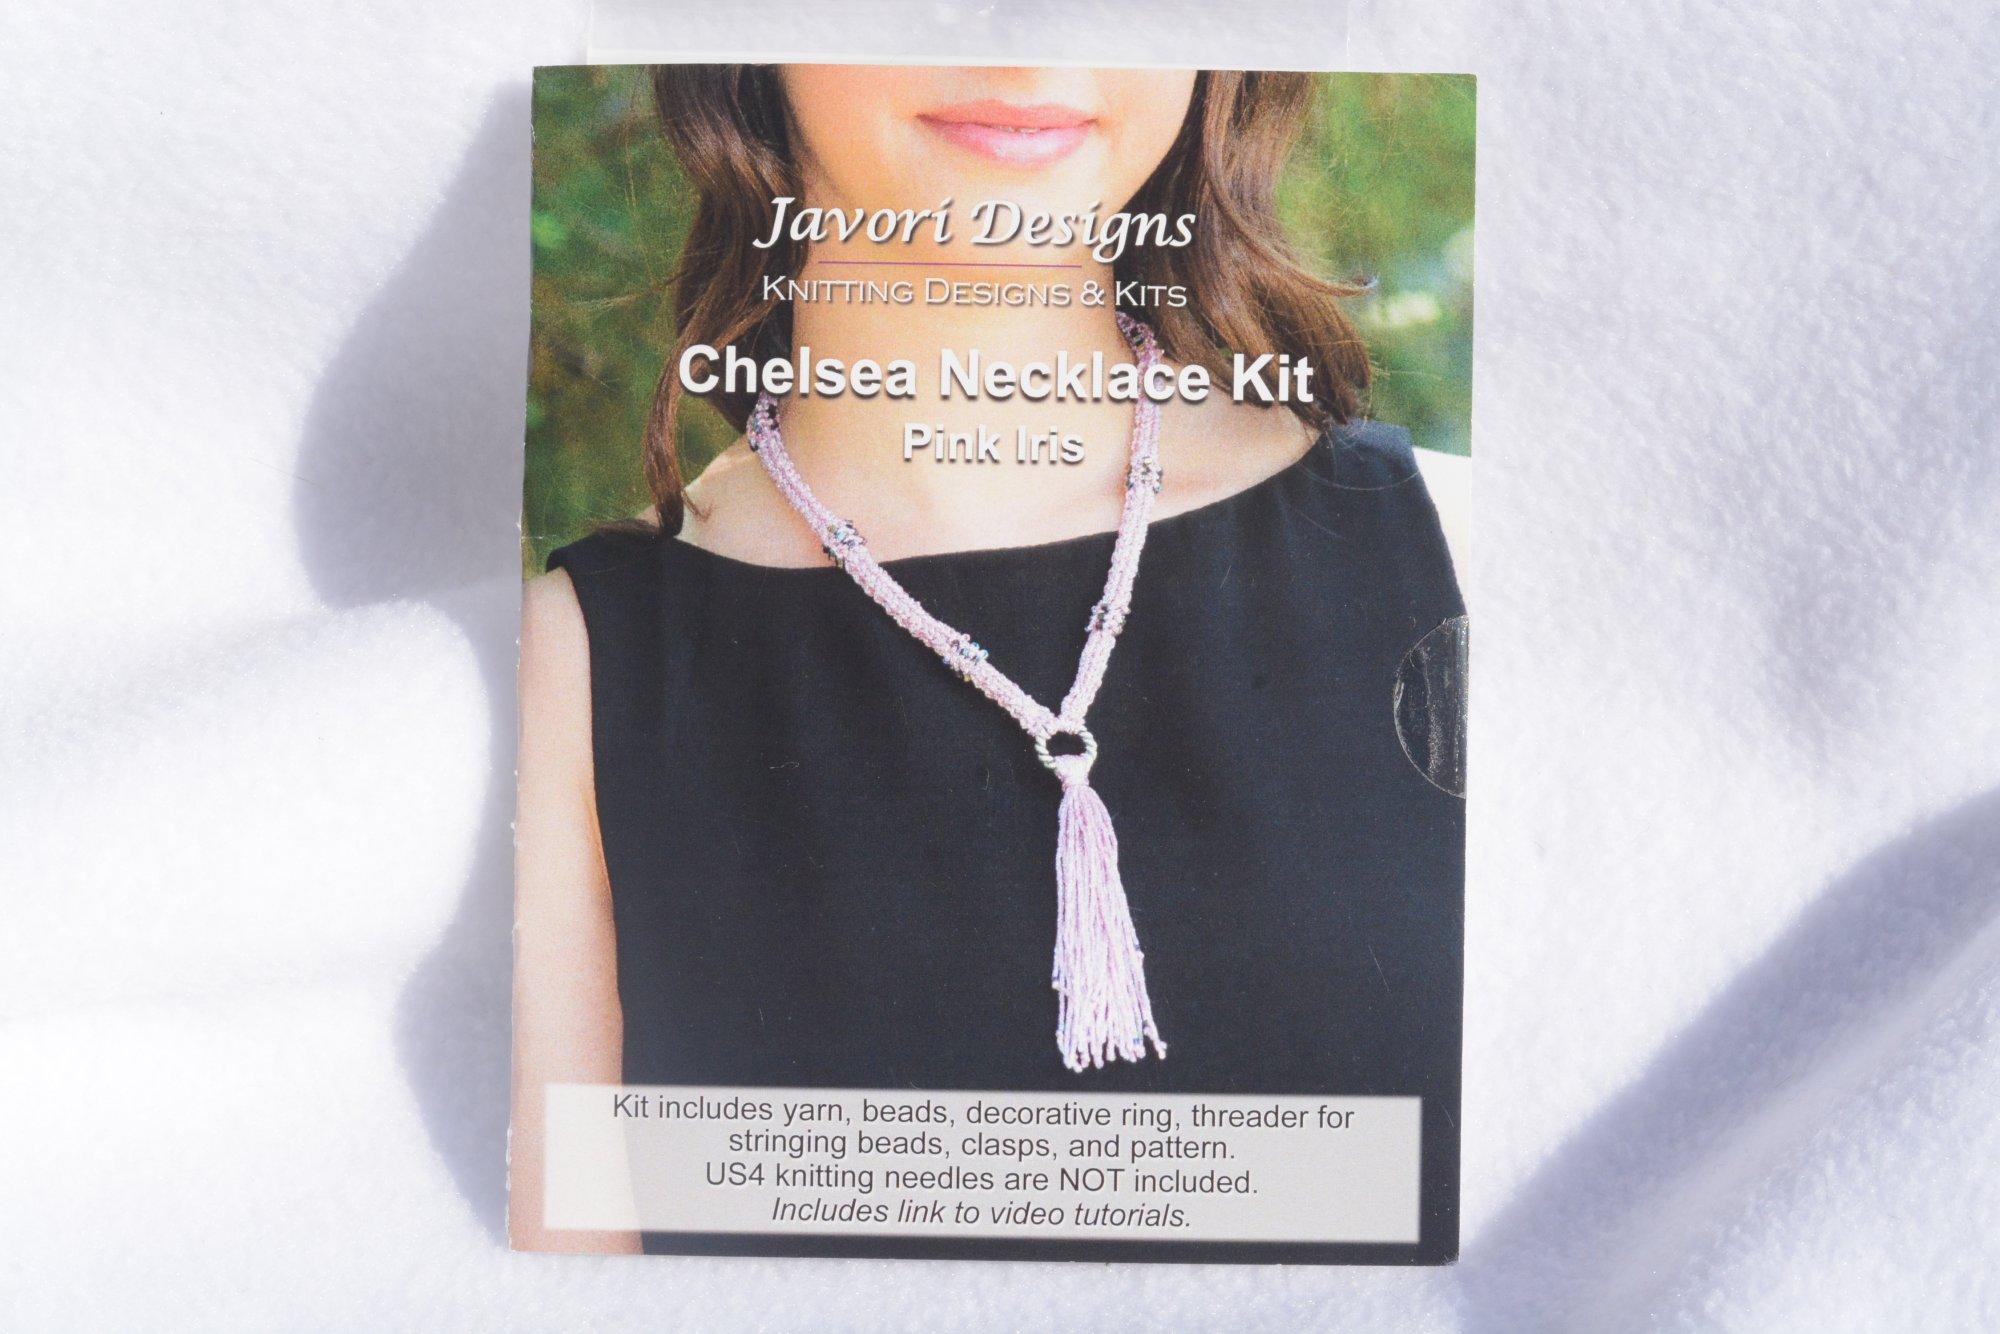 Chelsea Necklace Kit